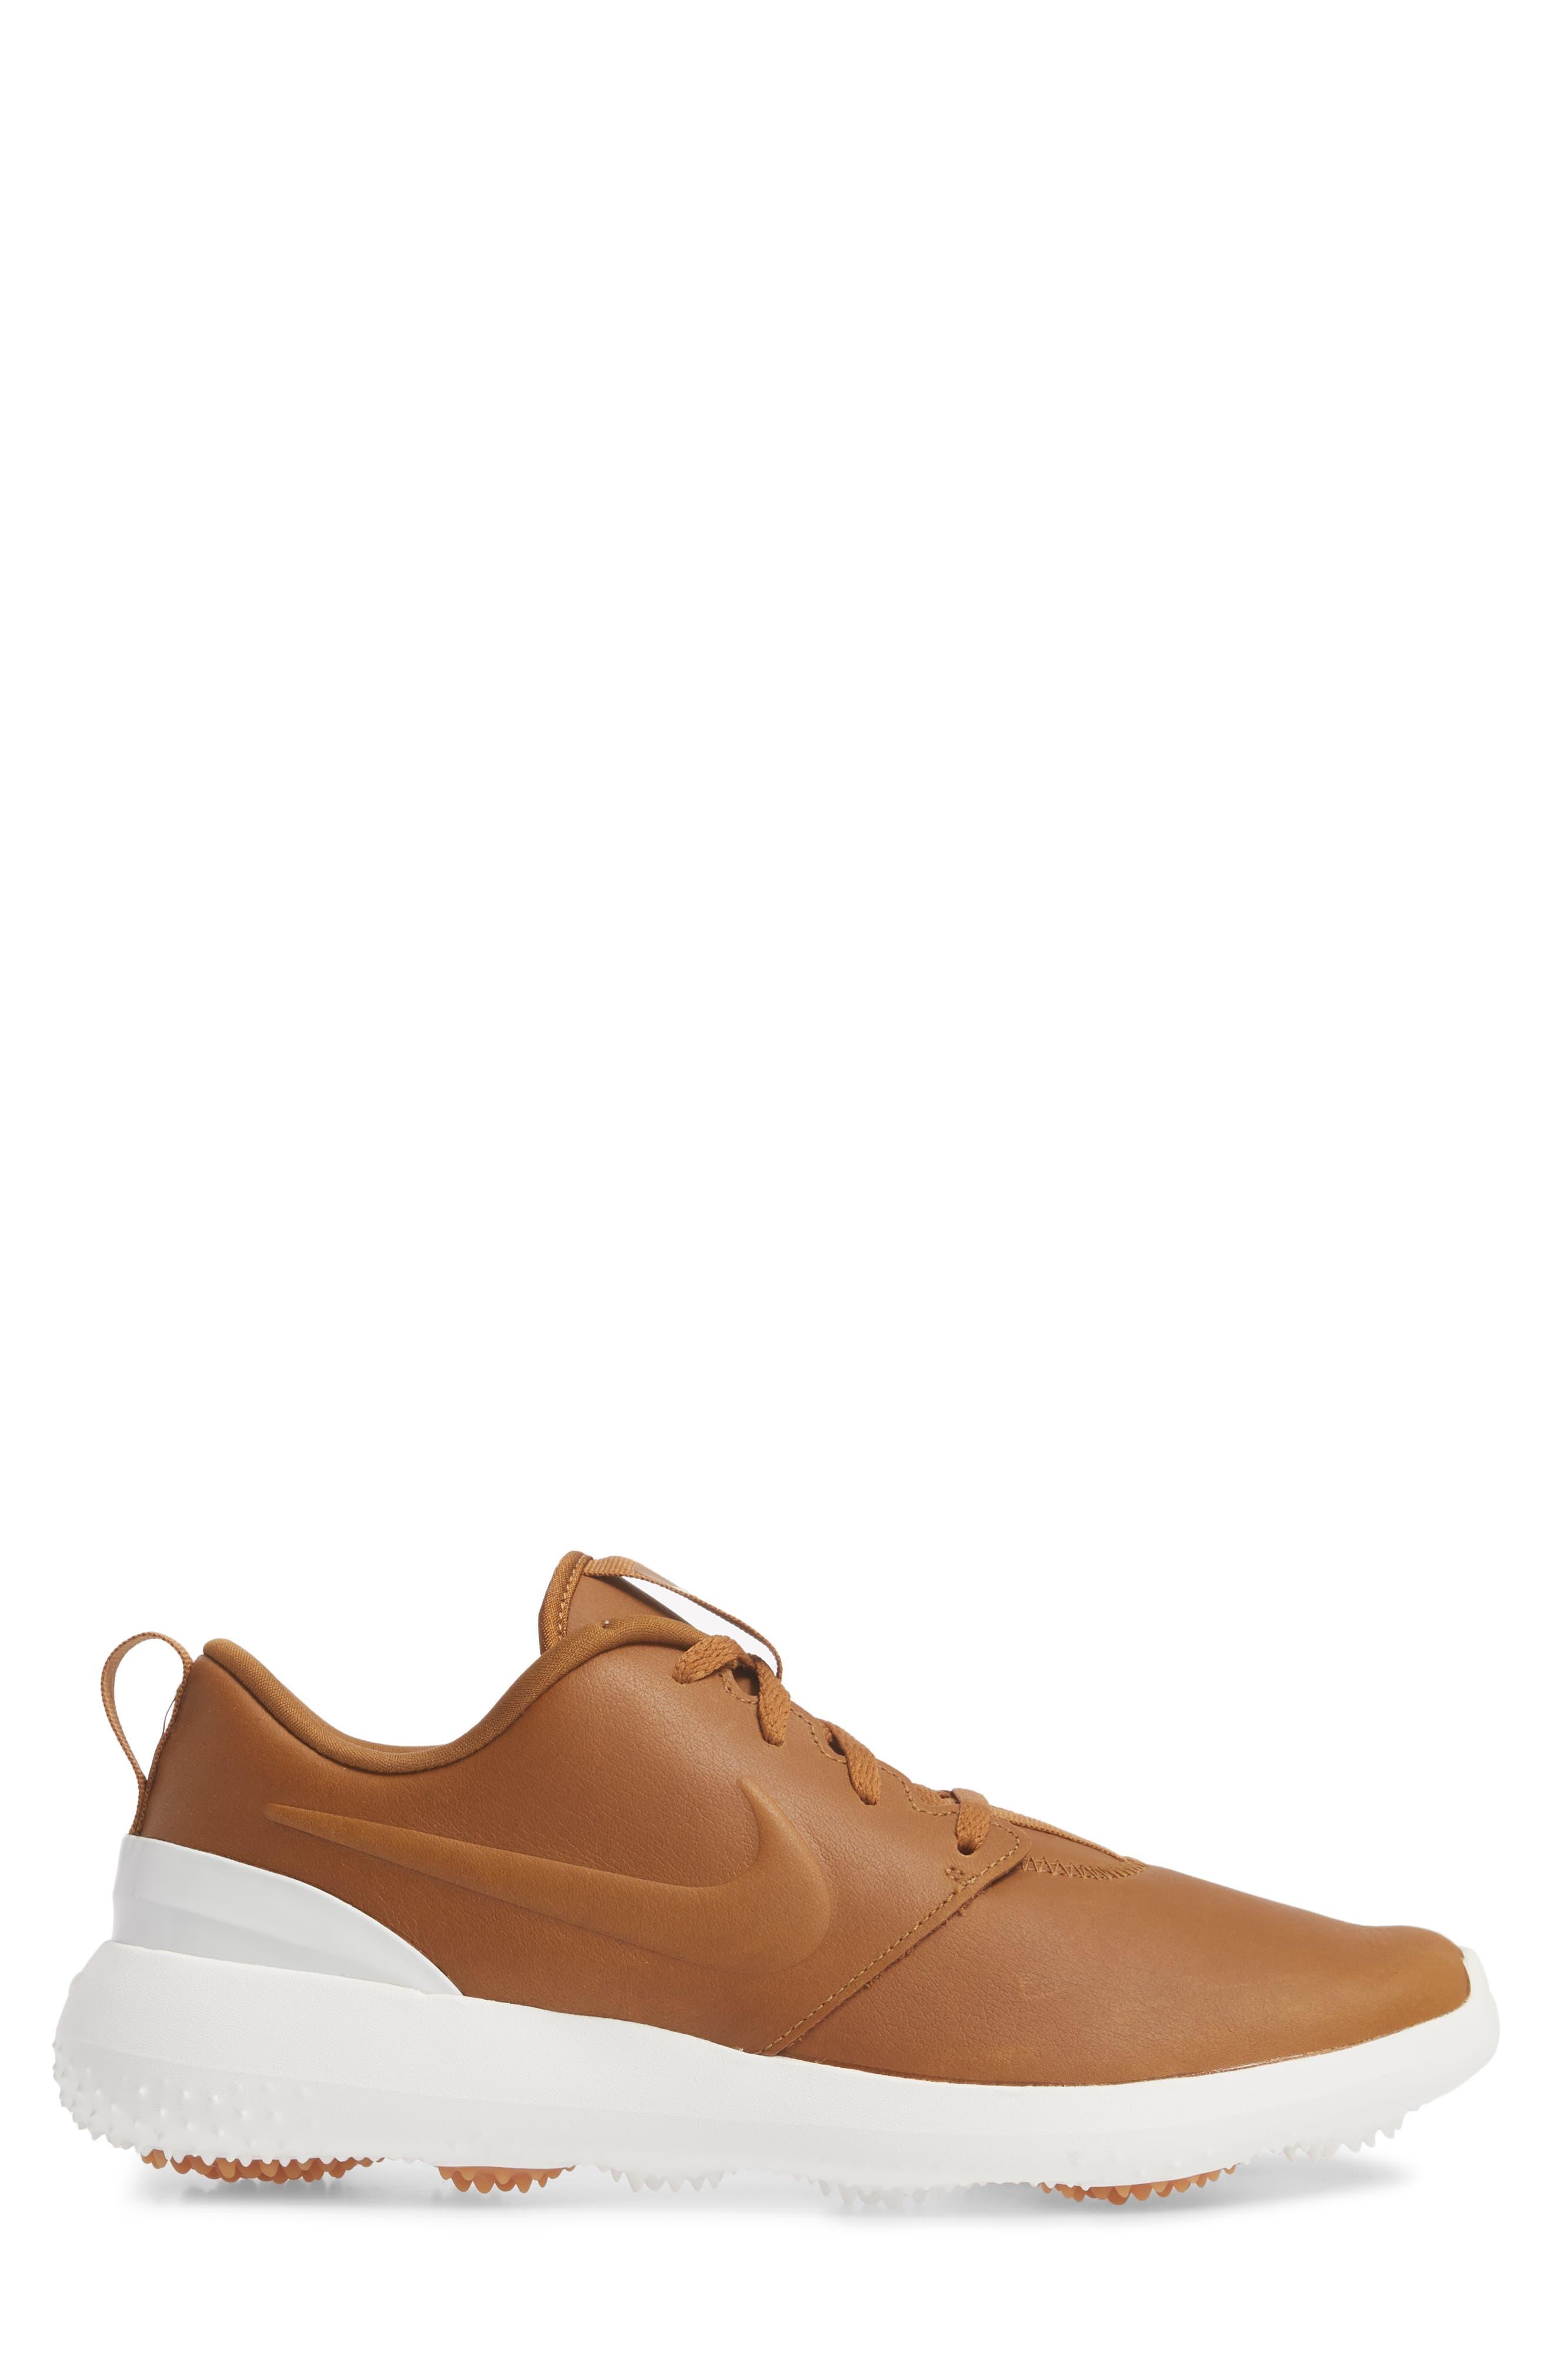 Roshe G Premium Golf Shoe,                             Alternate thumbnail 3, color,                             Ale Brown/ Ale Brown-White